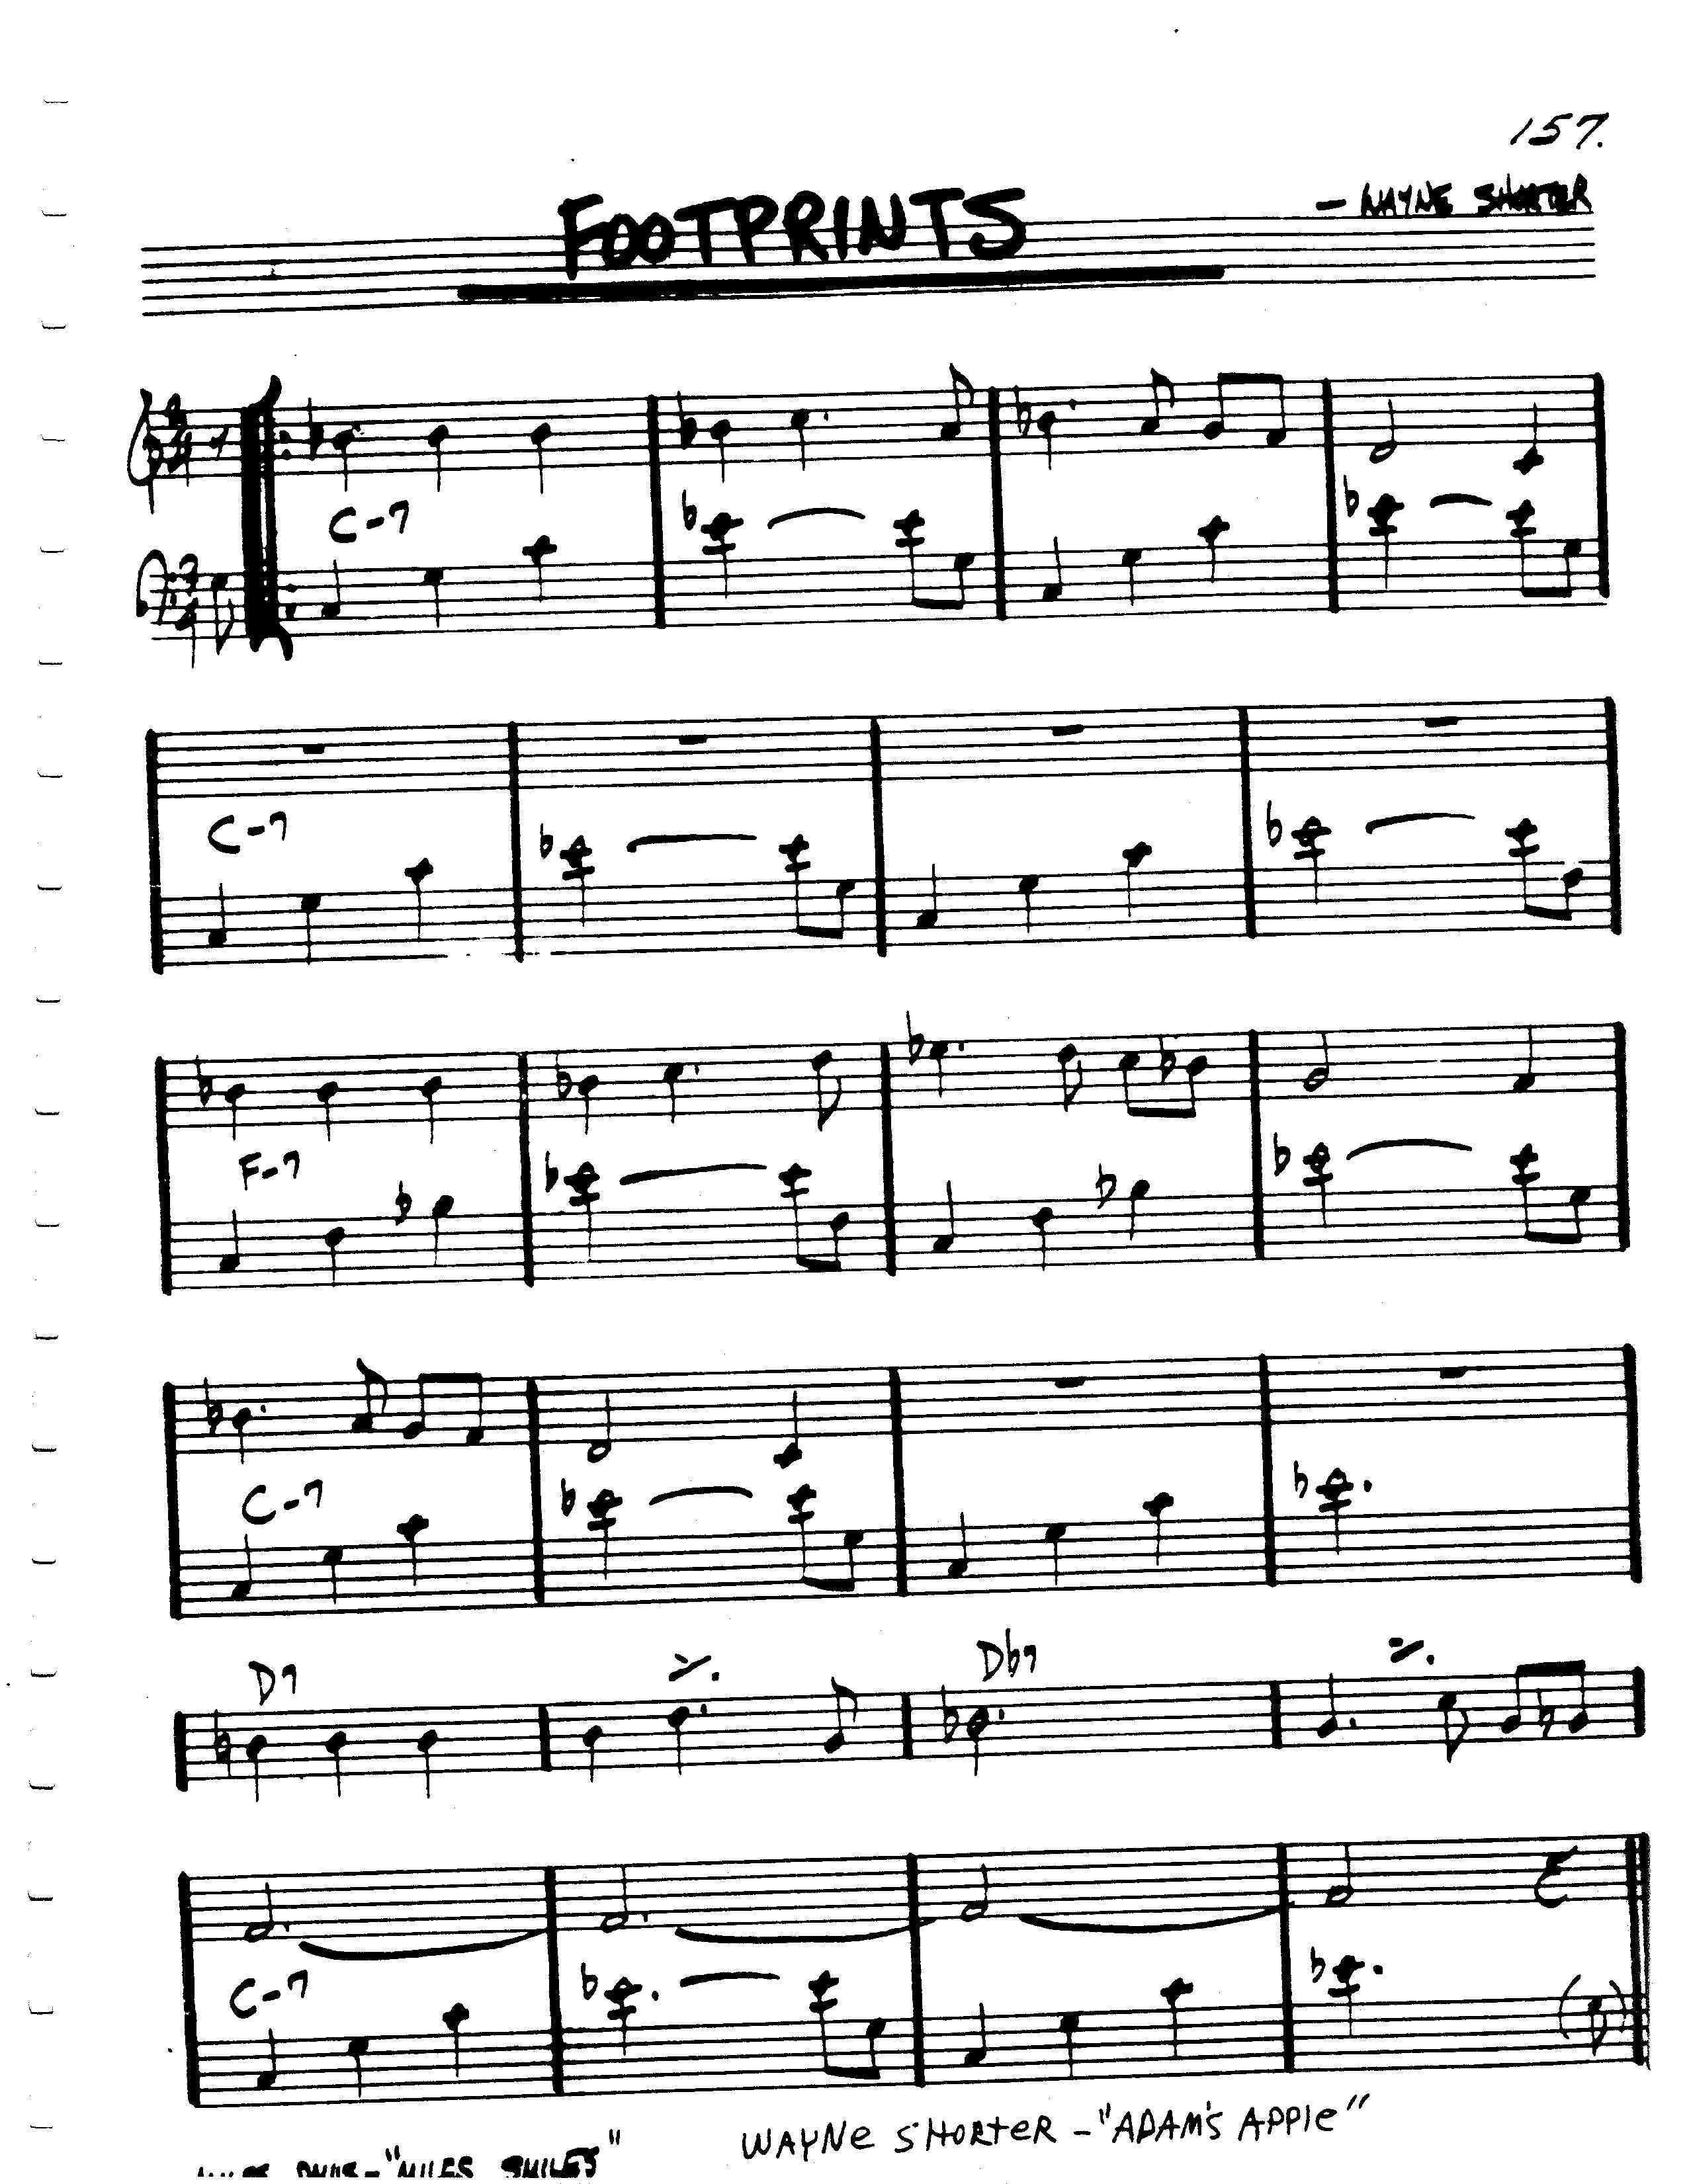 Imagen Relacionada Partituras De Jazz Musica Partituras Jazz